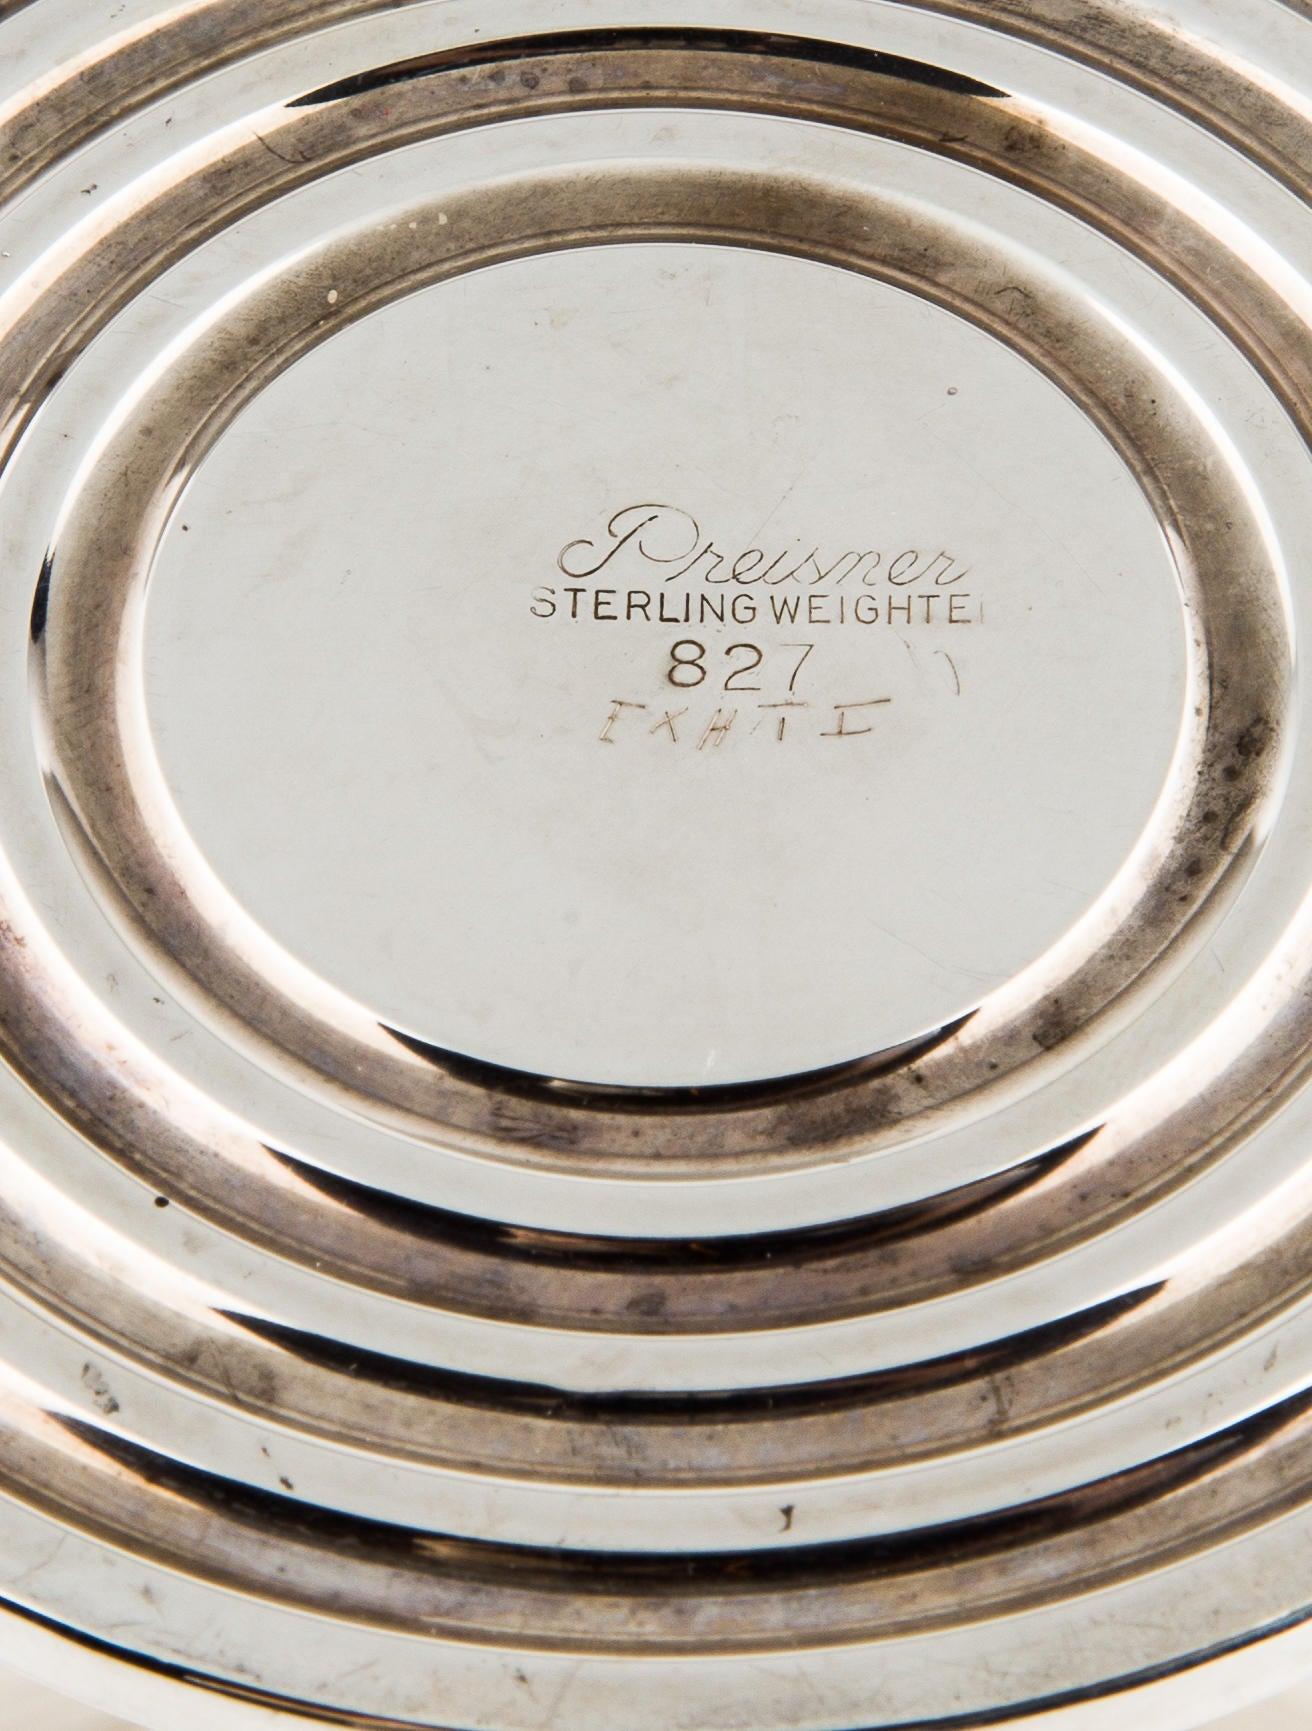 Sterling silver preisner compote decor and accessories for Artistic accents genuine silver decoration